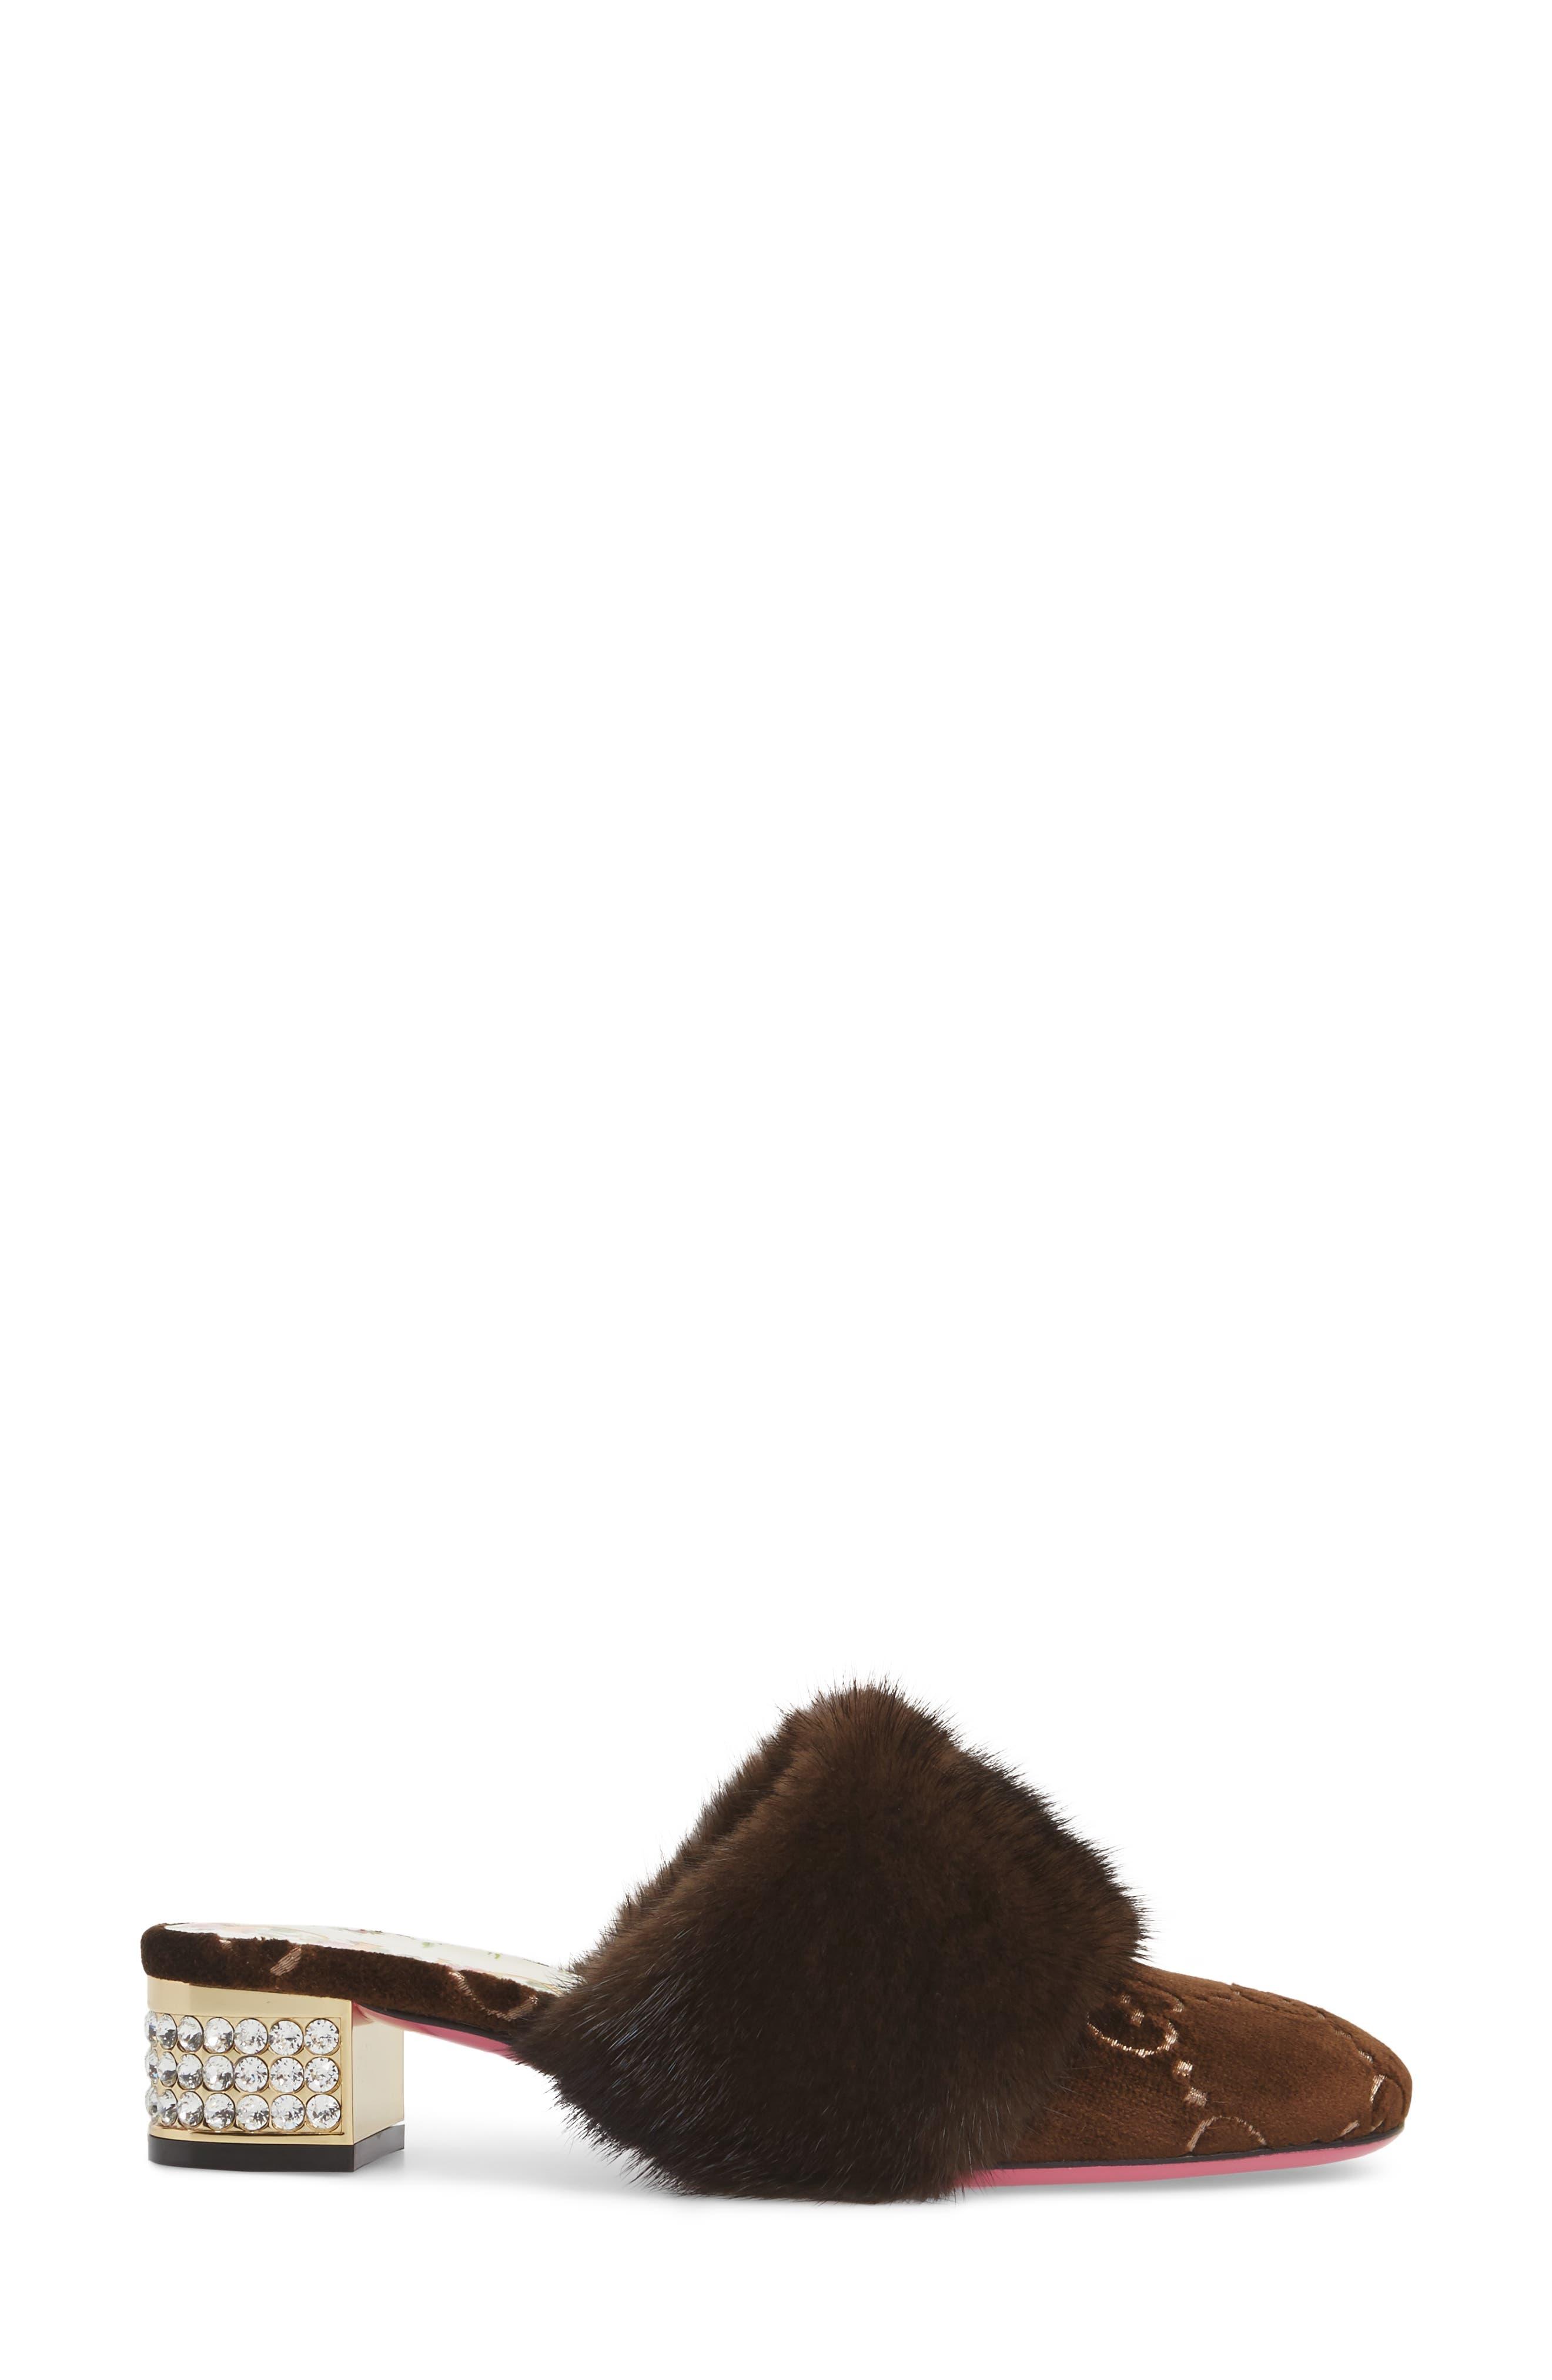 Candy Genuine Mink Fur Mule,                             Alternate thumbnail 3, color,                             MARRONE